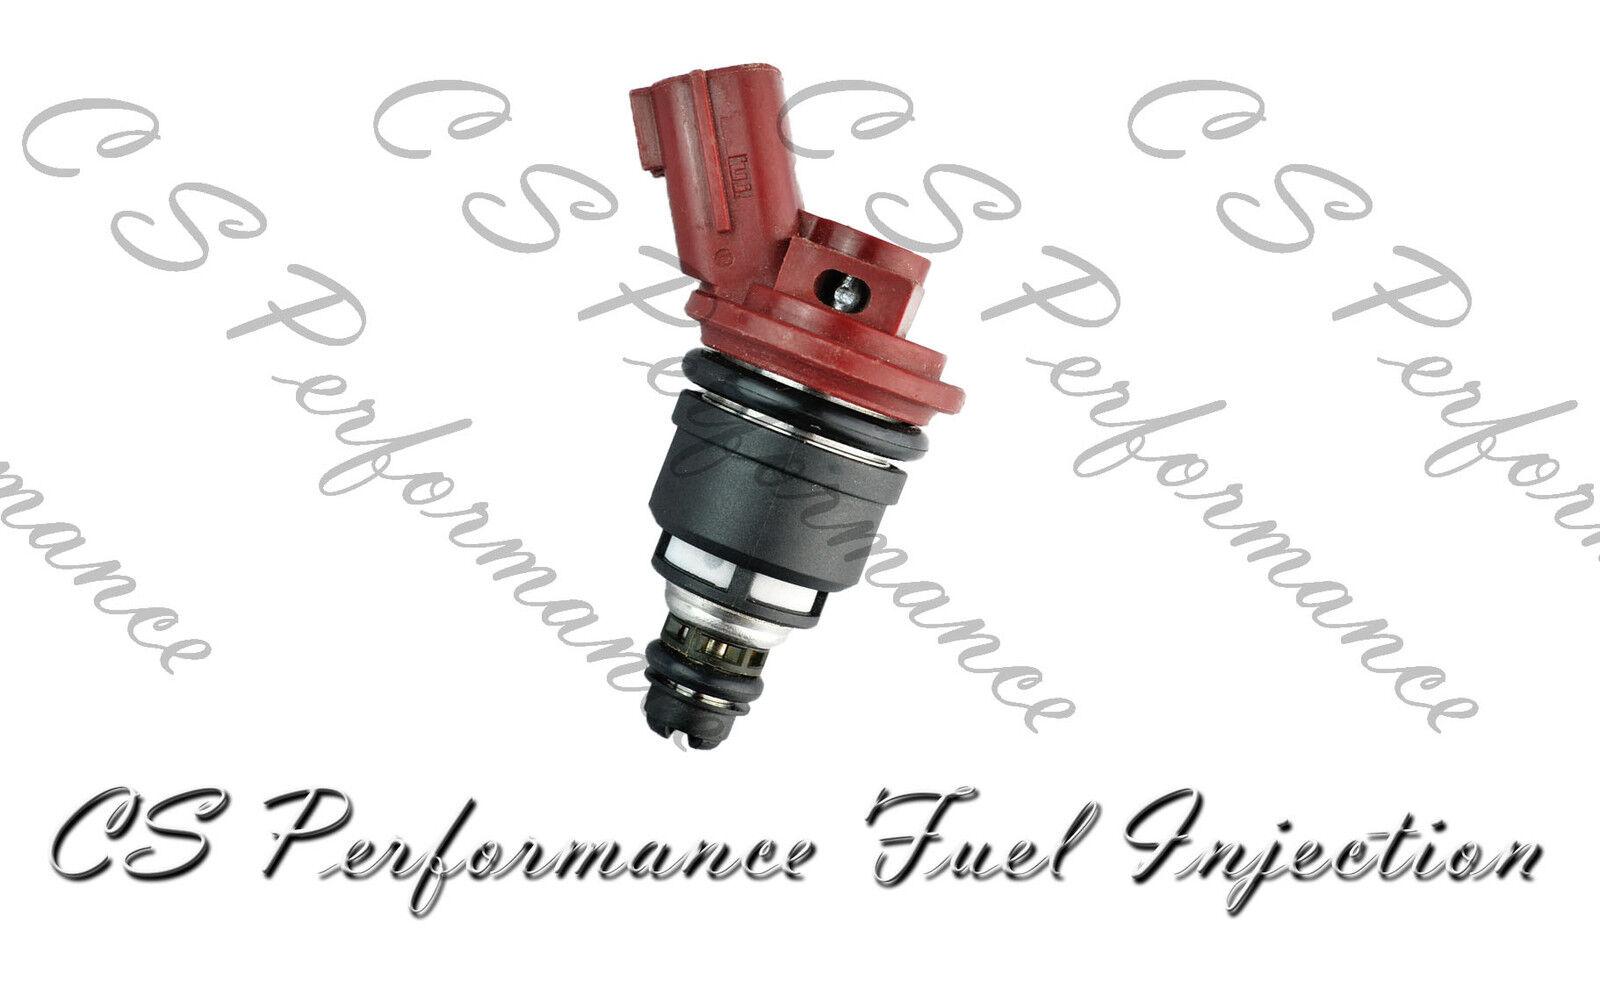 LIFETIME WARRANTY Flow-Matched Jecs Fuel Injector for Nissan Altima 2.4L